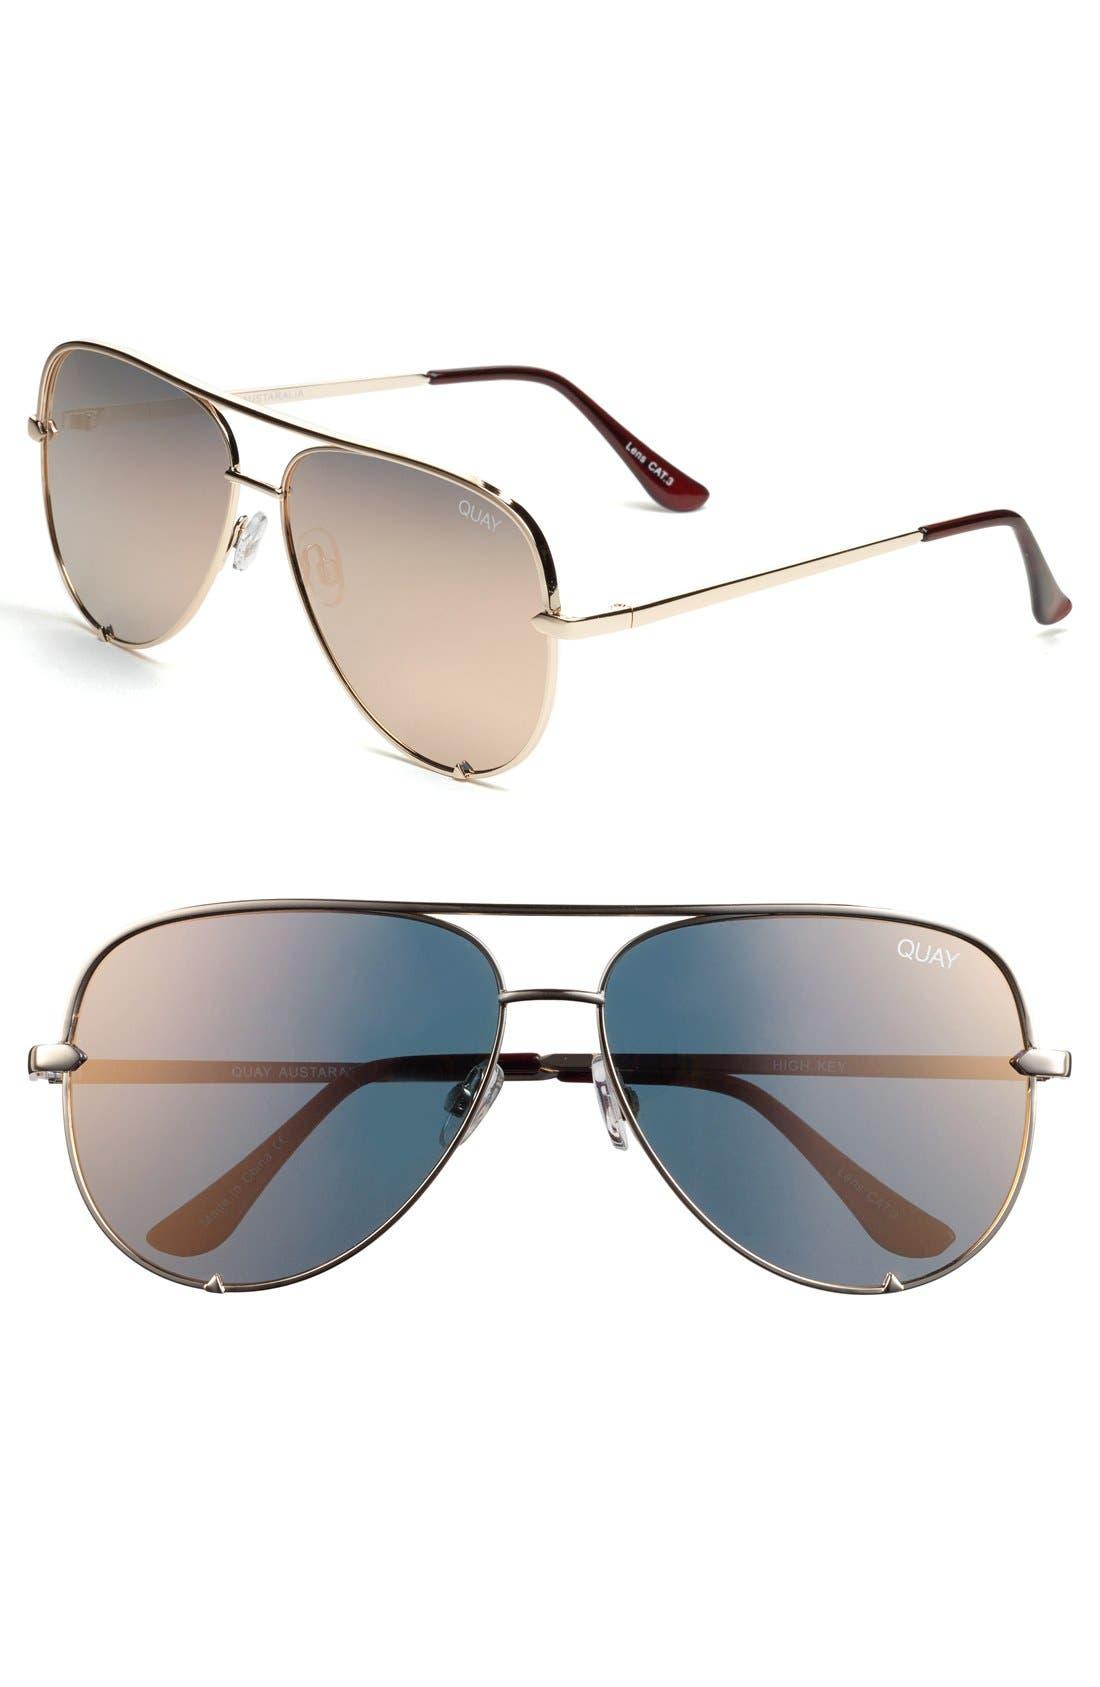 x Desi Perkins 'High Key' 62mm Aviator Sunglasses,                             Main thumbnail 1, color,                             Gold/ Gold Mirror